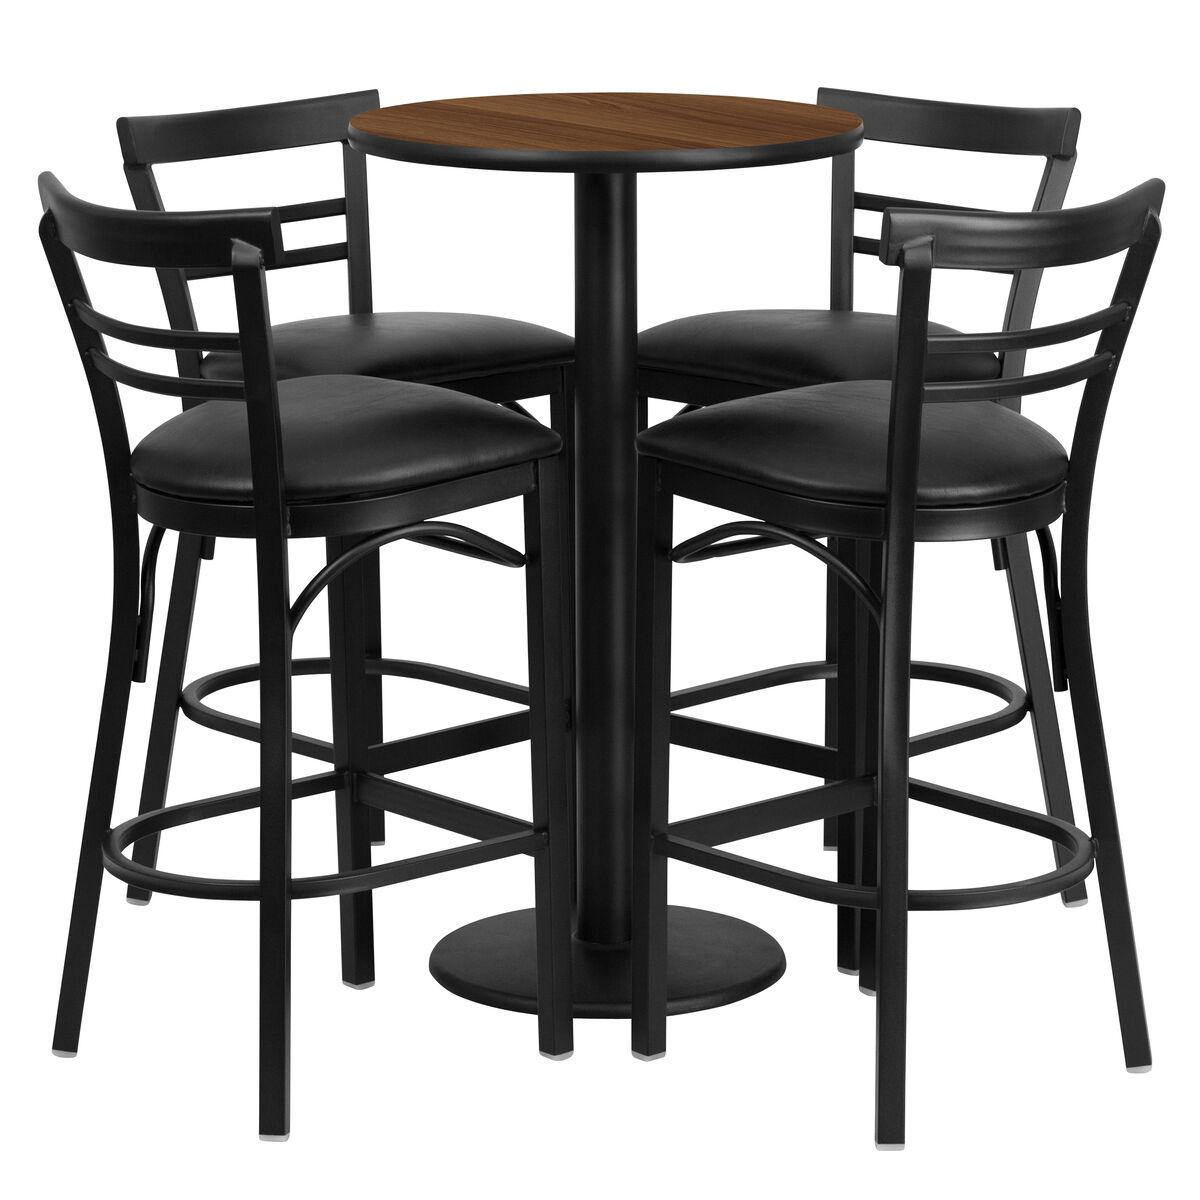 24rd Wa Bar Table Bk Vyl Seat Rest 019 Bk Wal Tdr